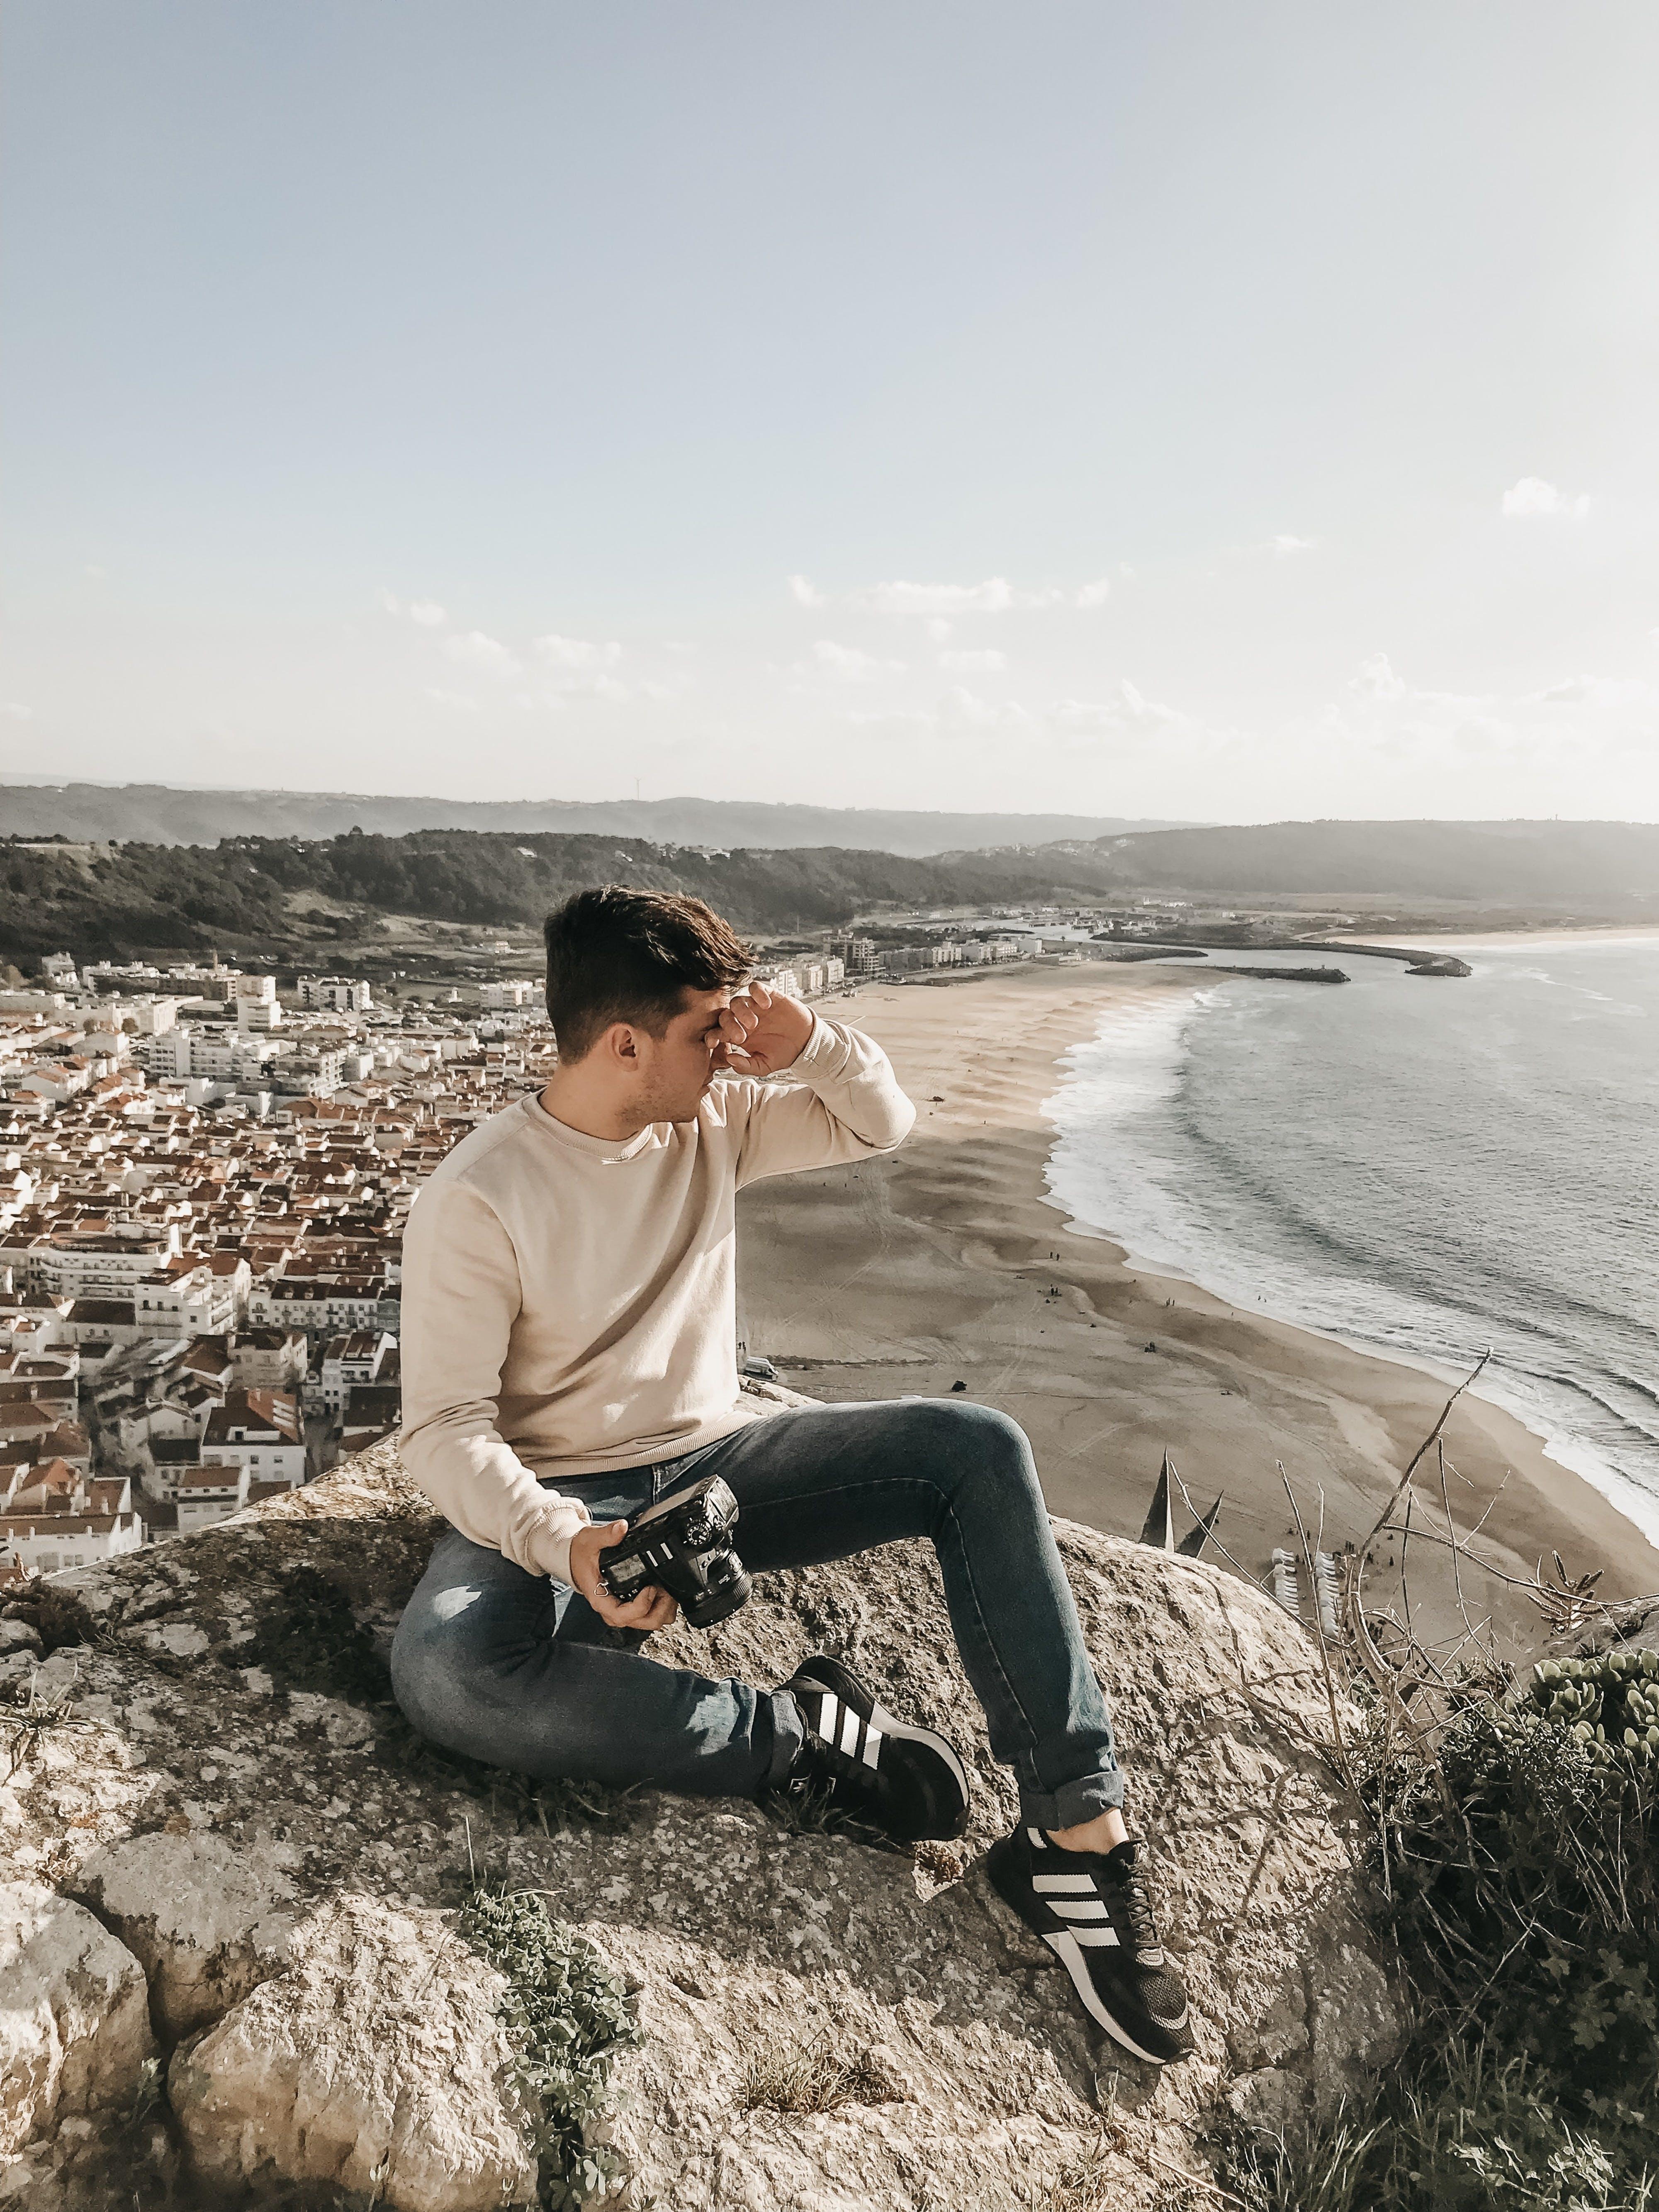 Photographer Holding DSLR Camera Sitting on a Huge Rock